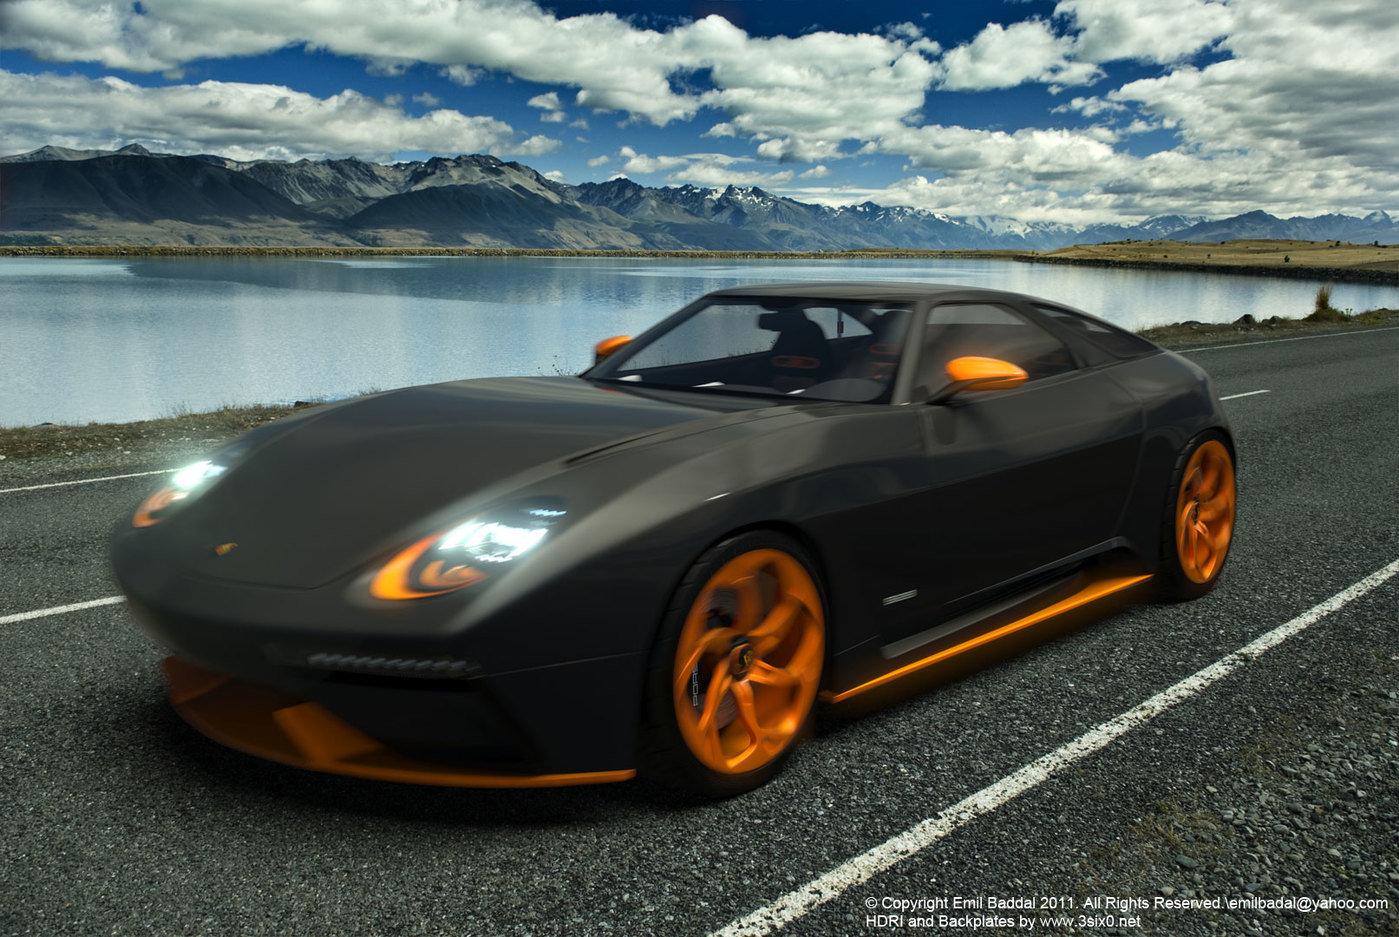 Porsche 928 Concept By Emil Baddal At Coroflot Com